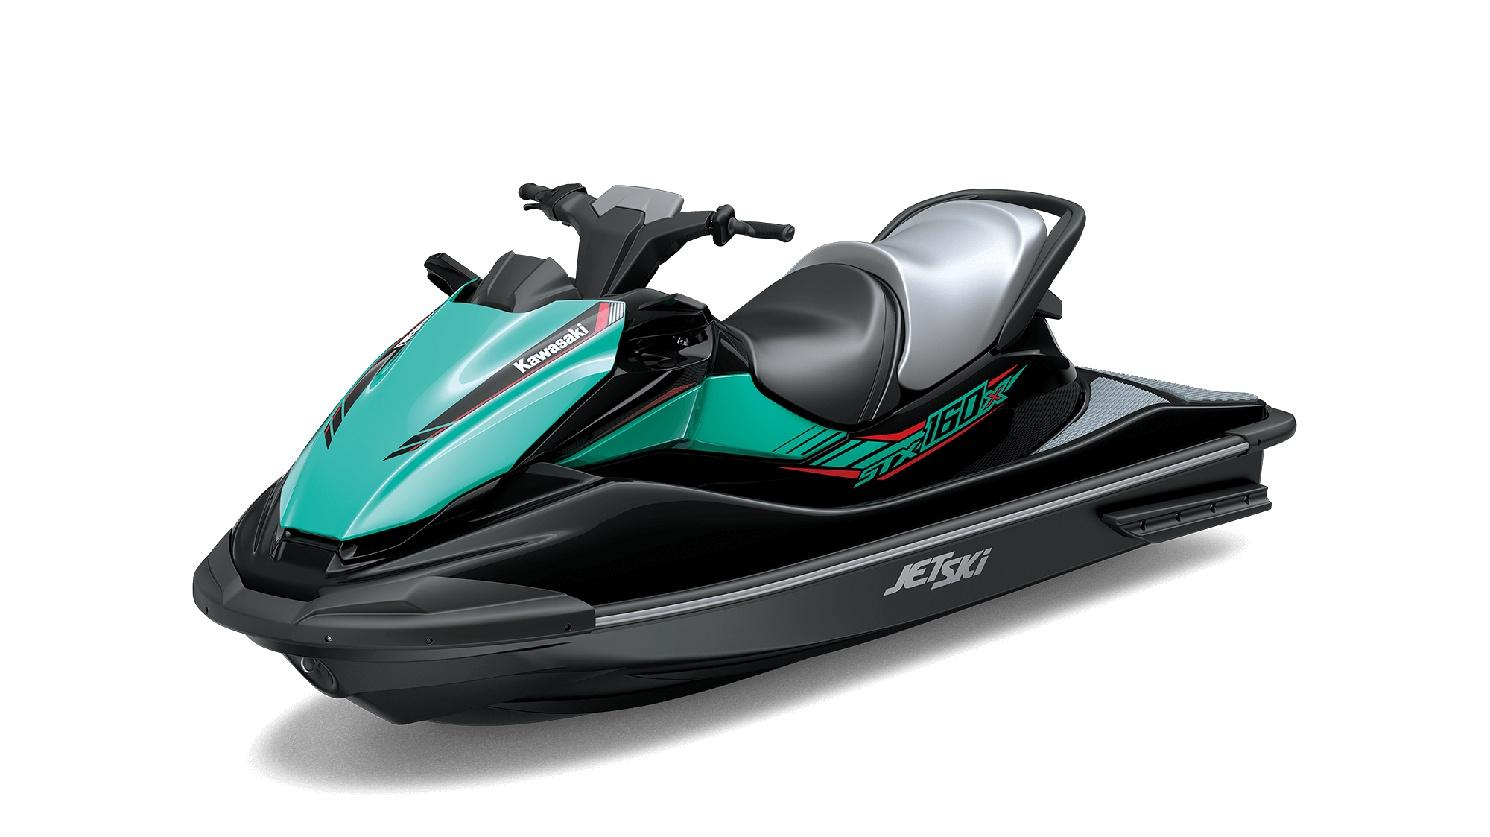 2020 Kawasaki JET SKI STX-160X Ebony/Turquoise